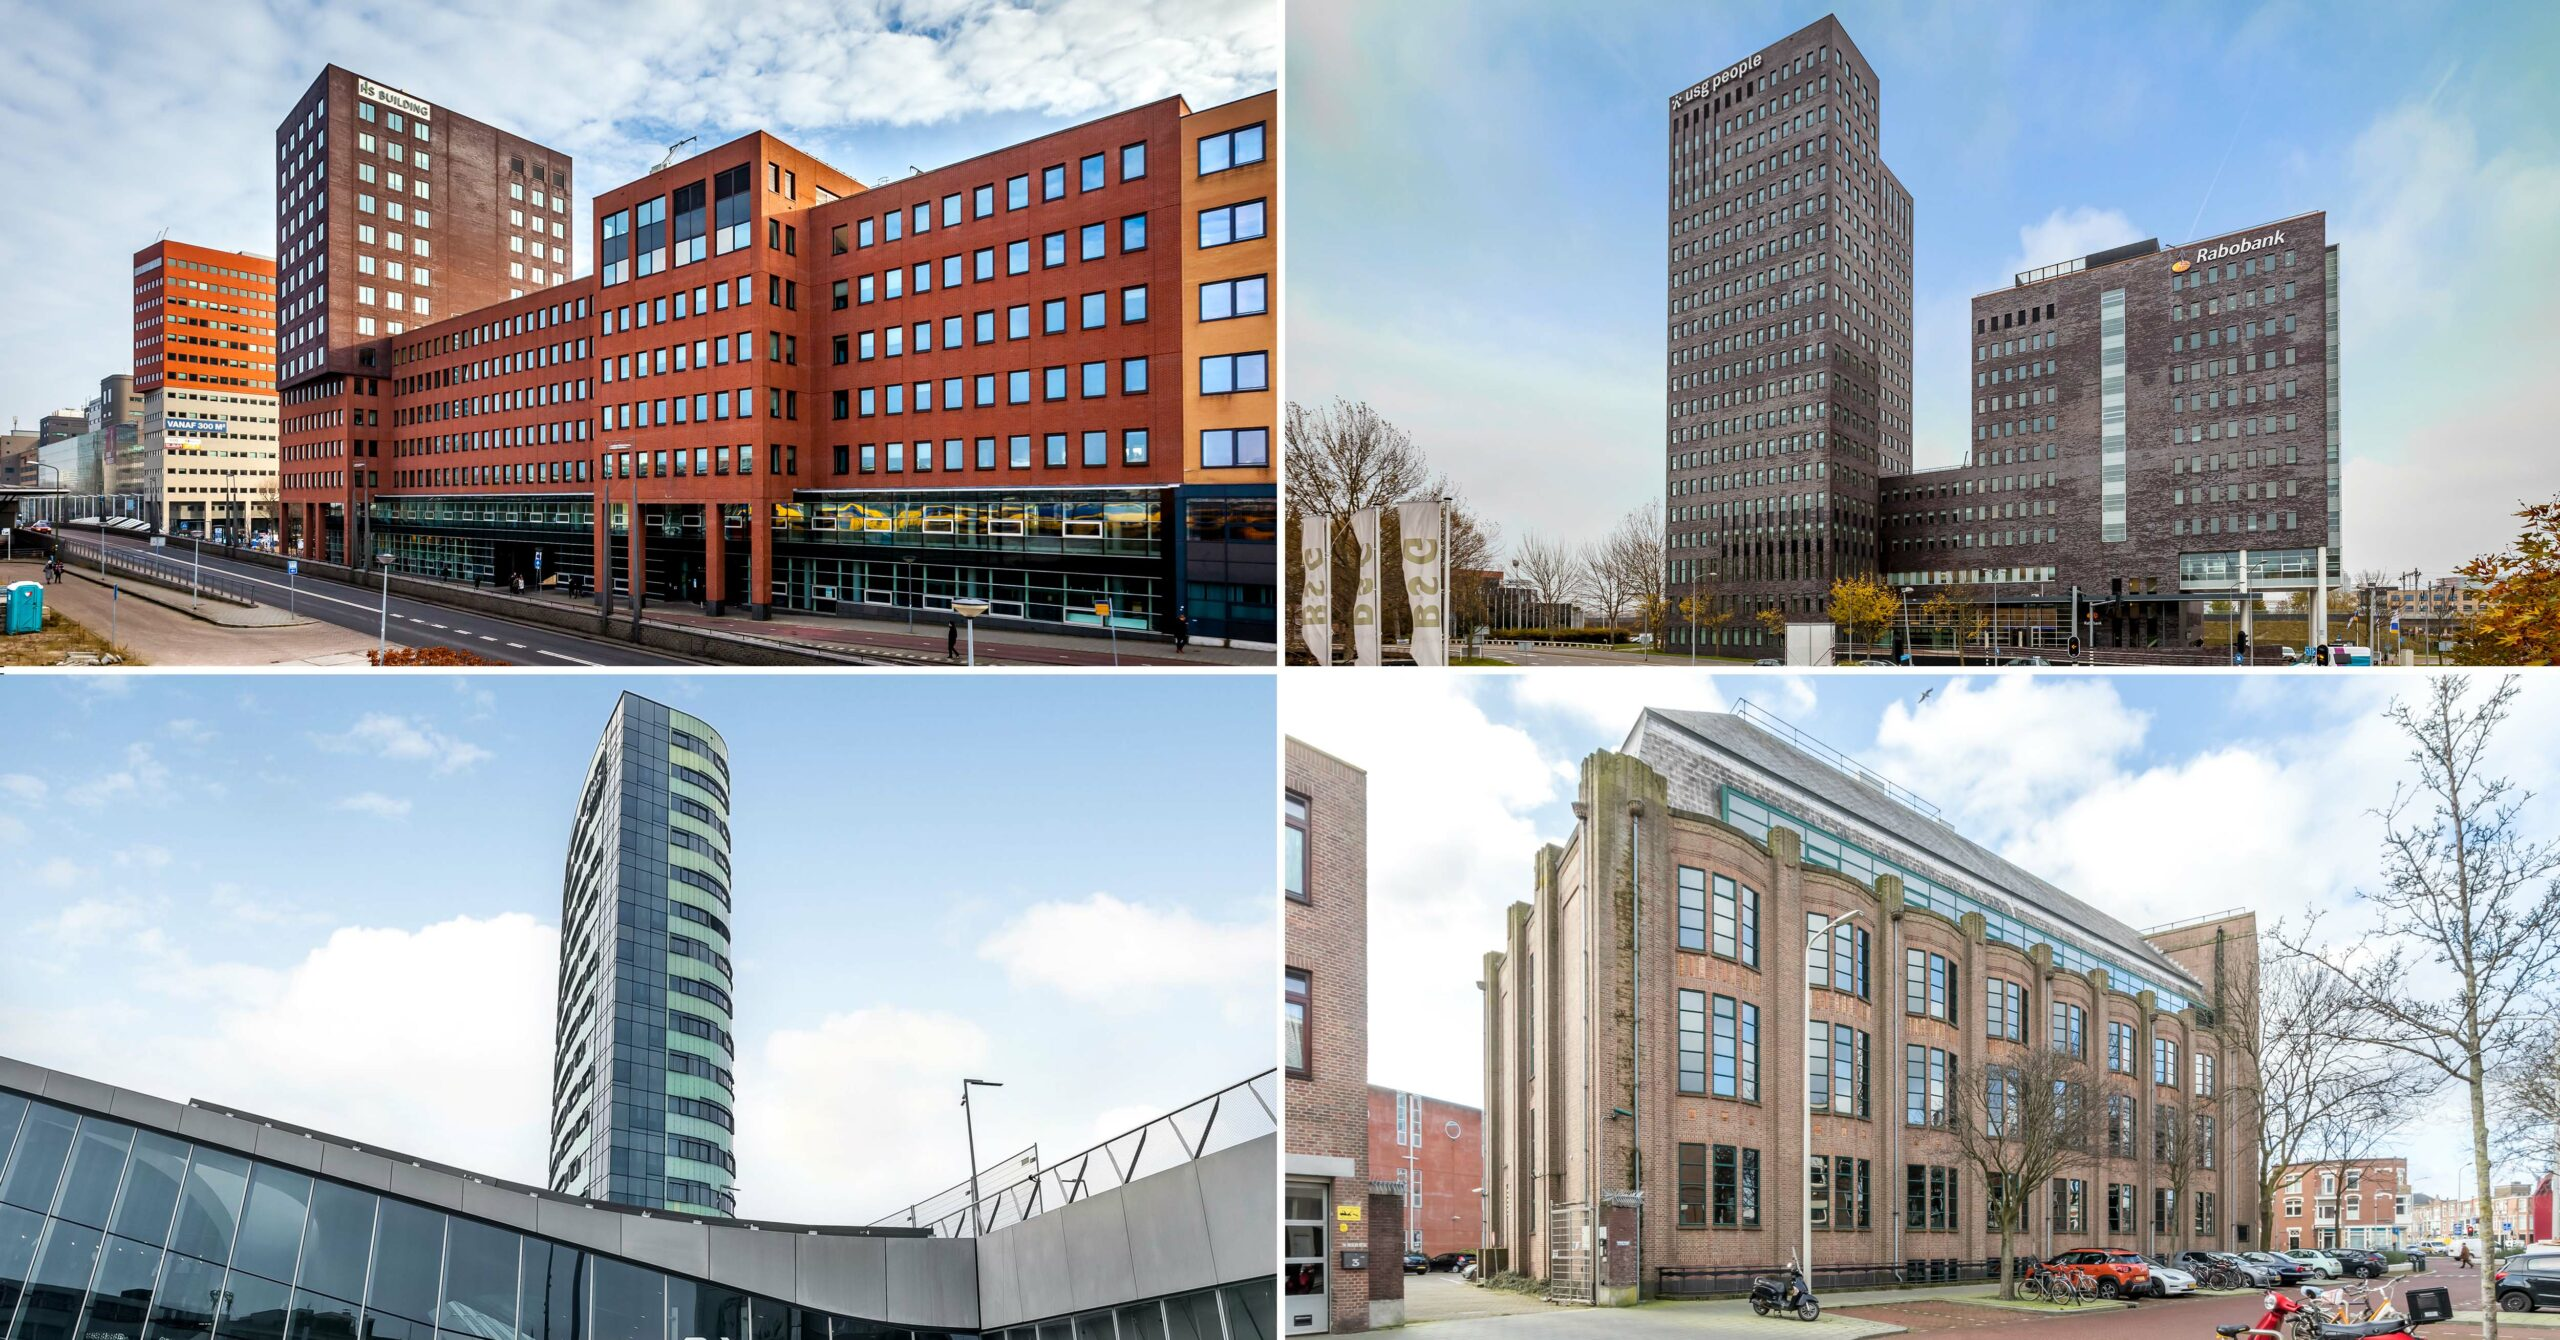 Spring Property Management further expands its portfolio